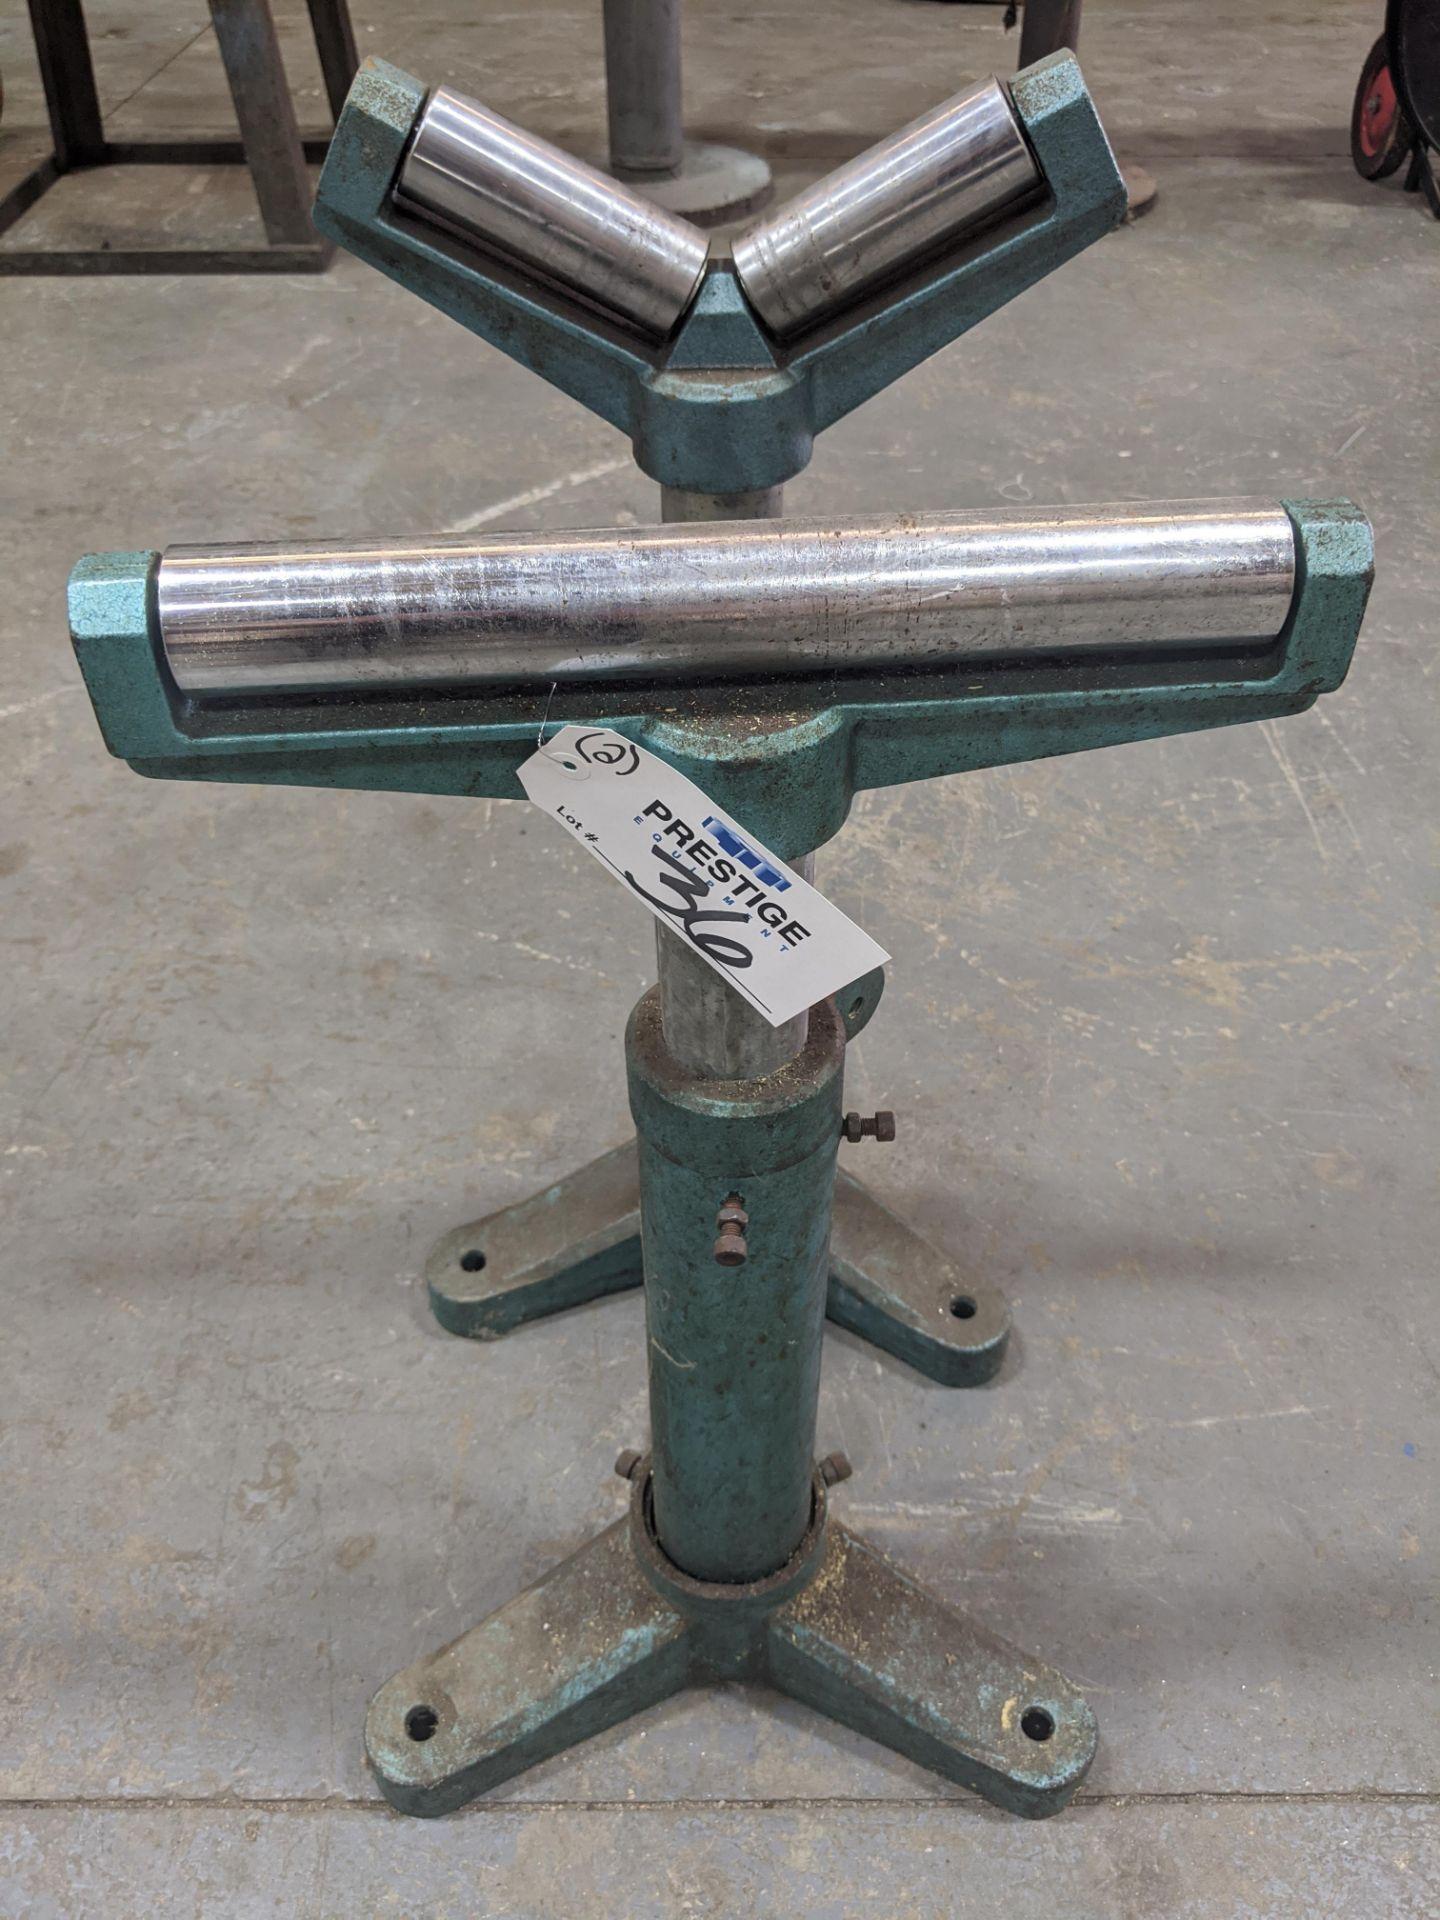 Lot 36 - Adjustable Material Roller Stands